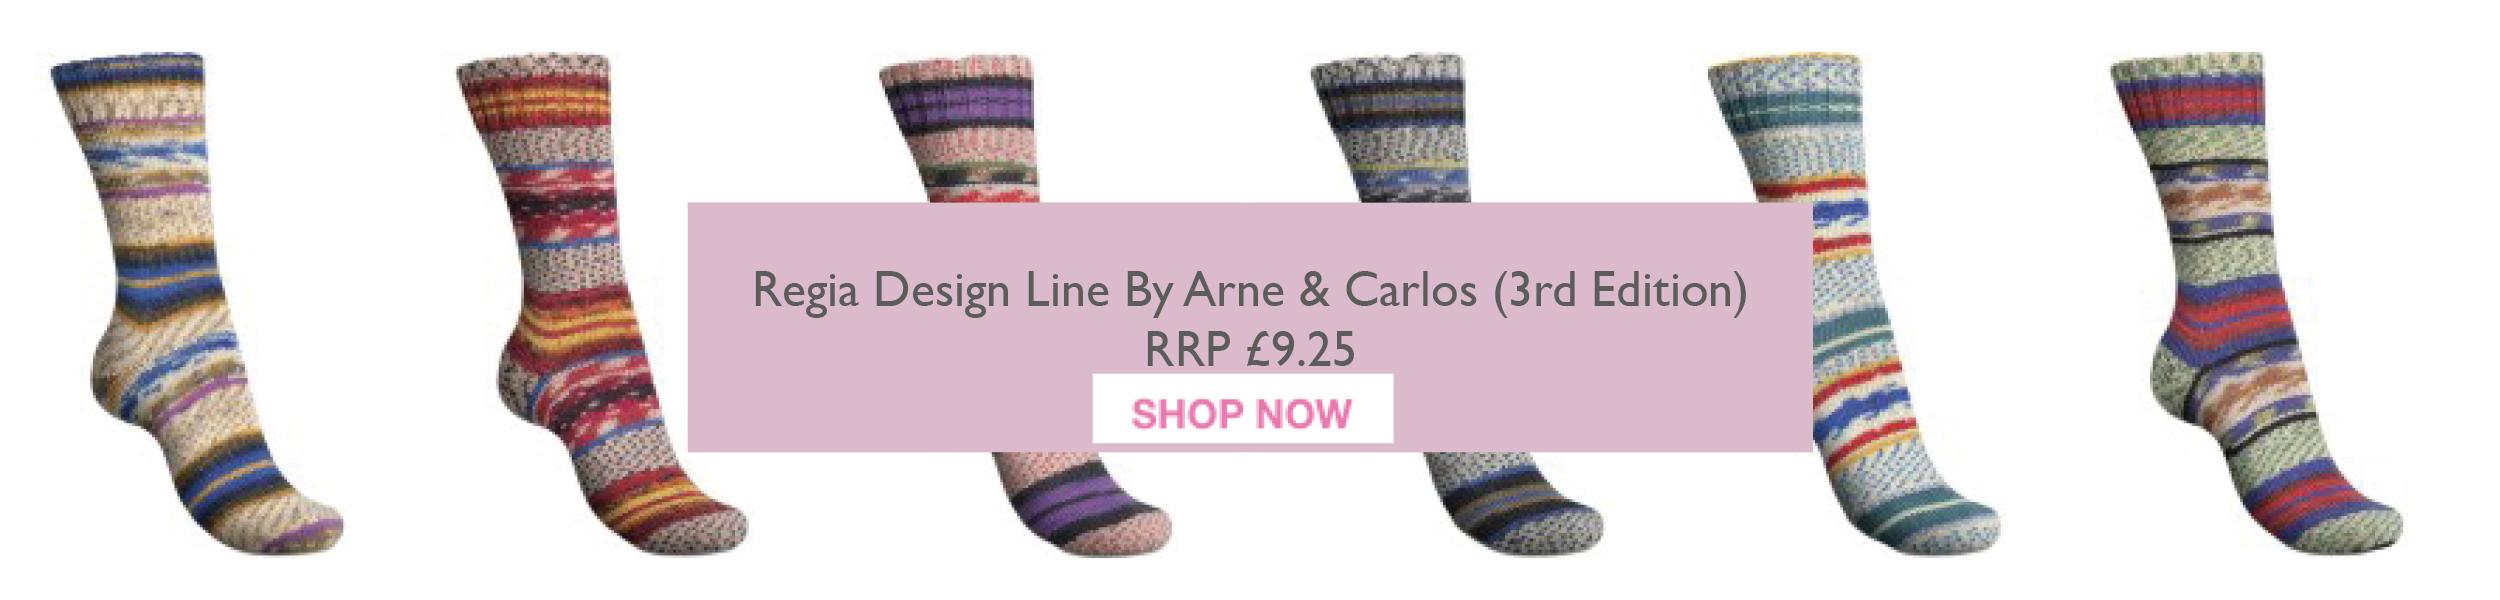 arne & carlos products 2